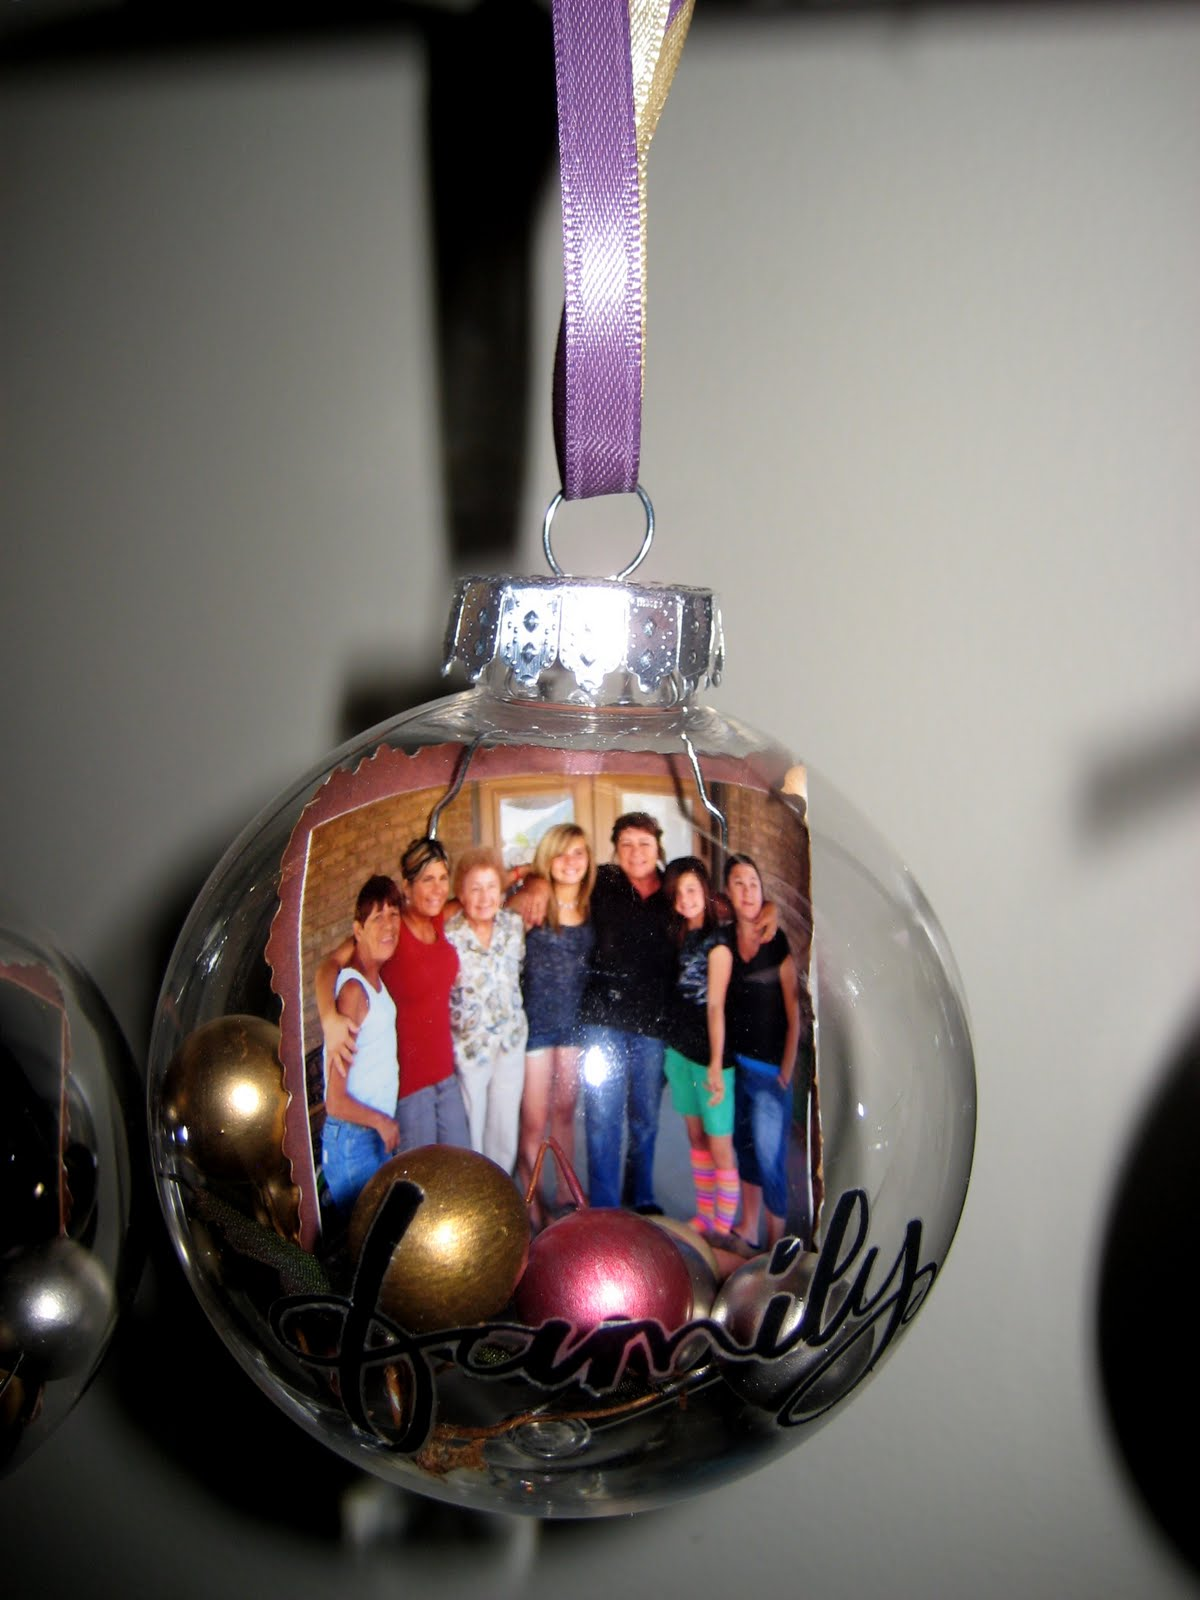 Personalized Christmas Bulbs